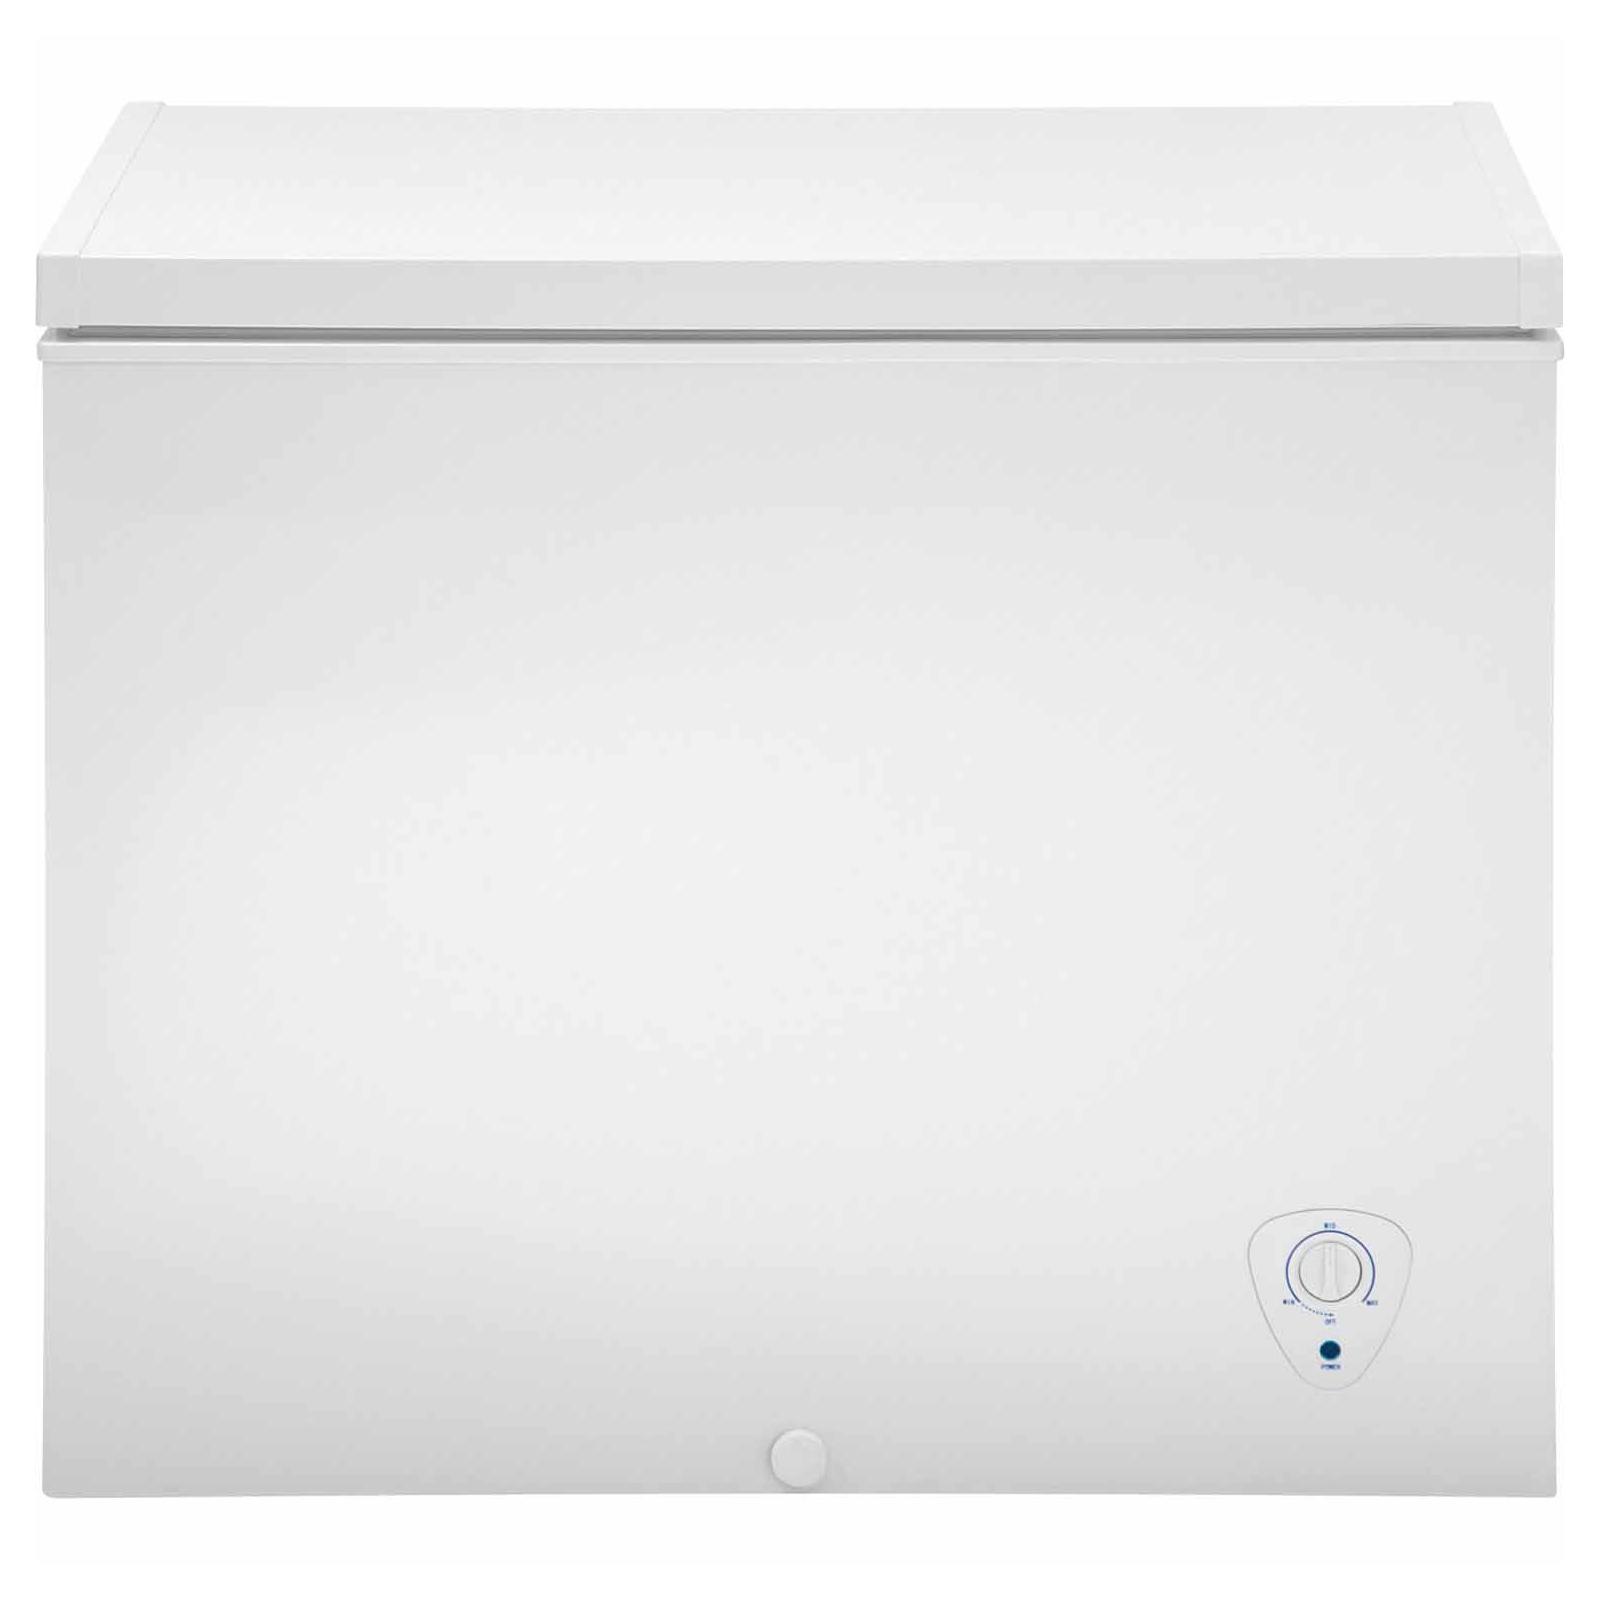 kenmore chest freezer wiring diagram [ 1600 x 1600 Pixel ]